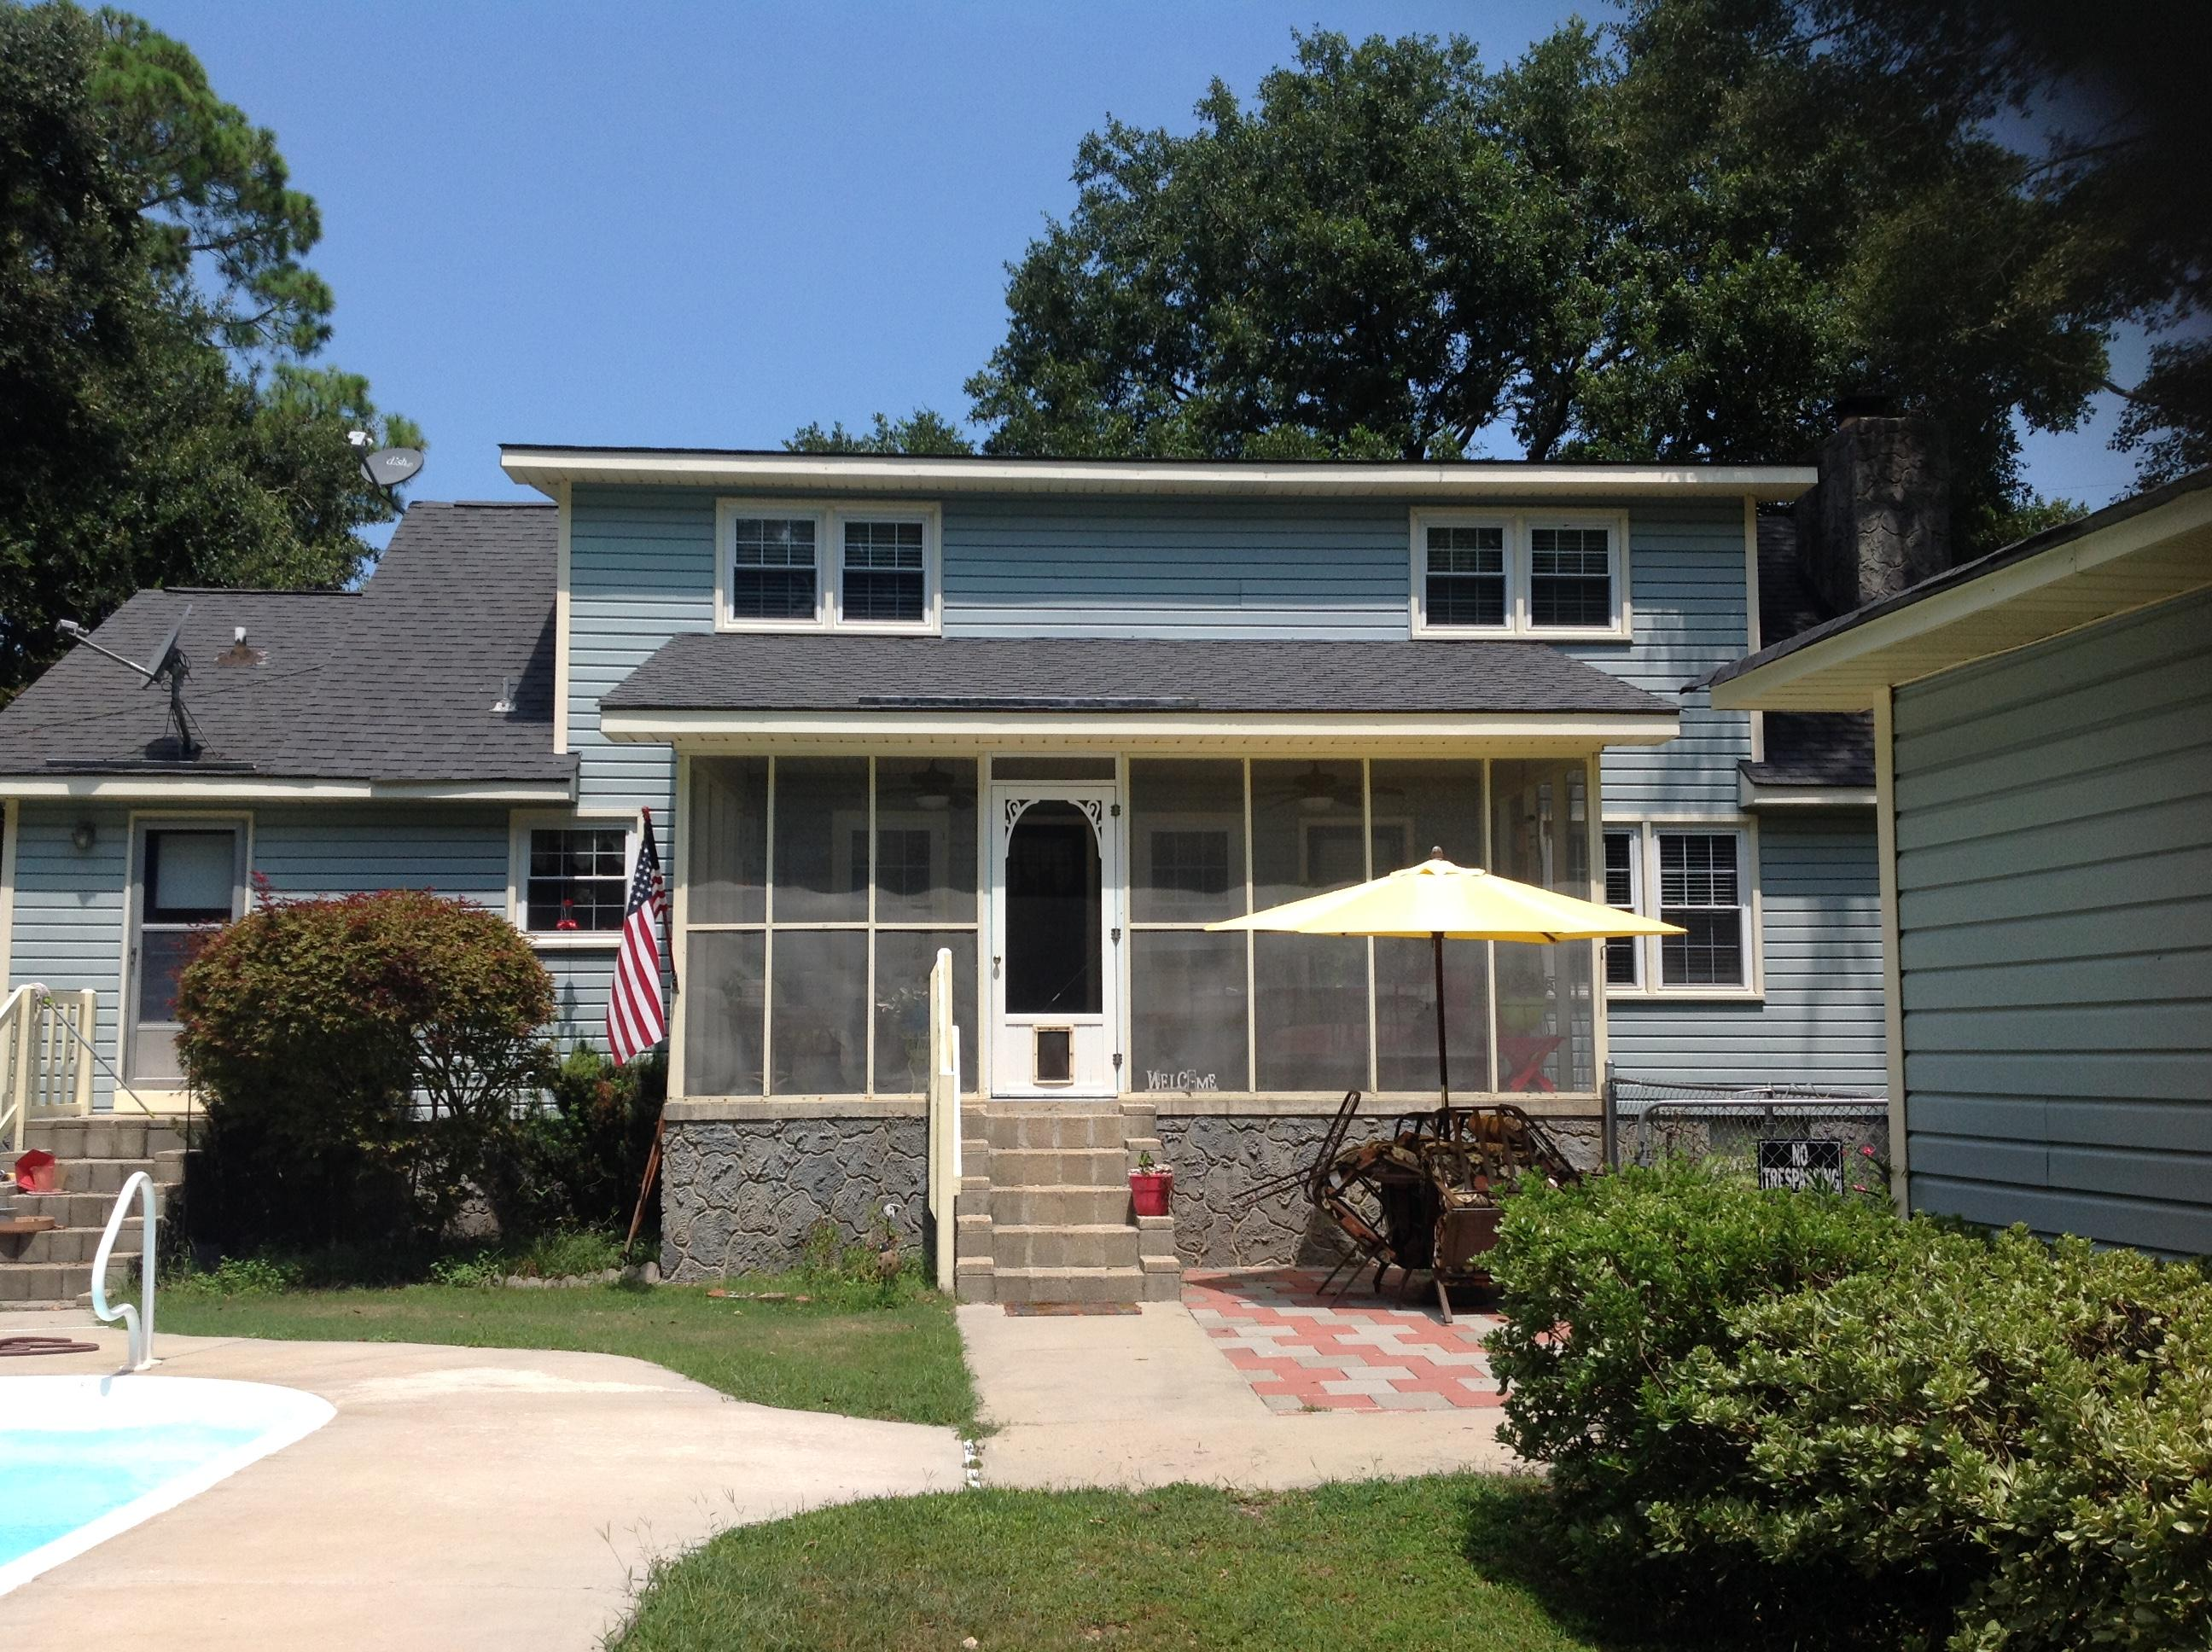 Belvedere II Homes For Sale - 122 Dogwood, Eutawville, SC - 1